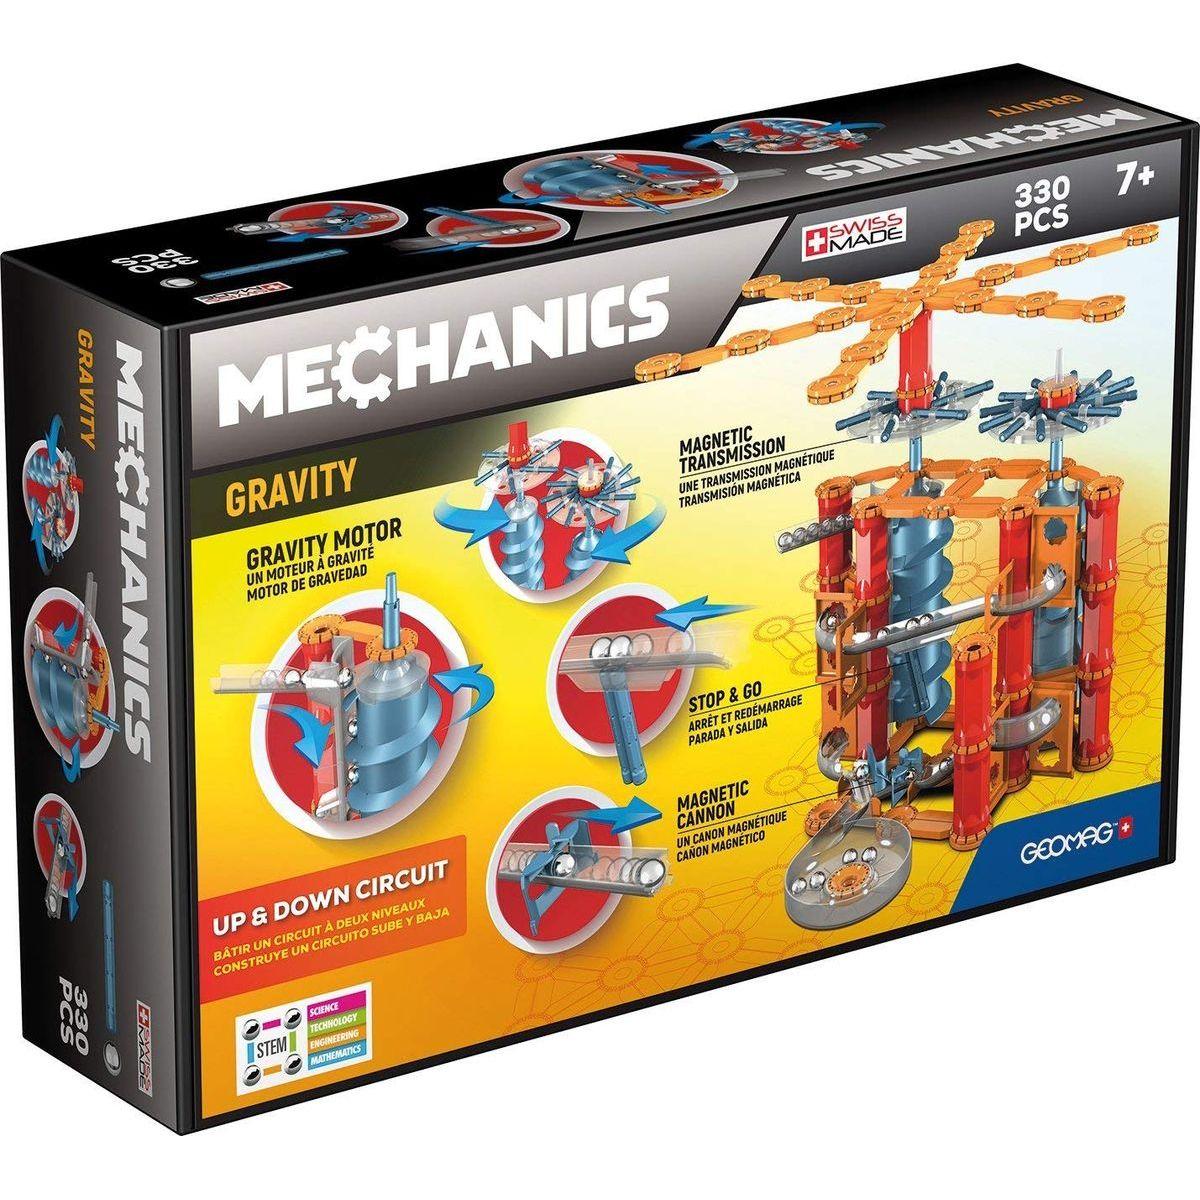 GEOMAG Mechanics Gravity 330